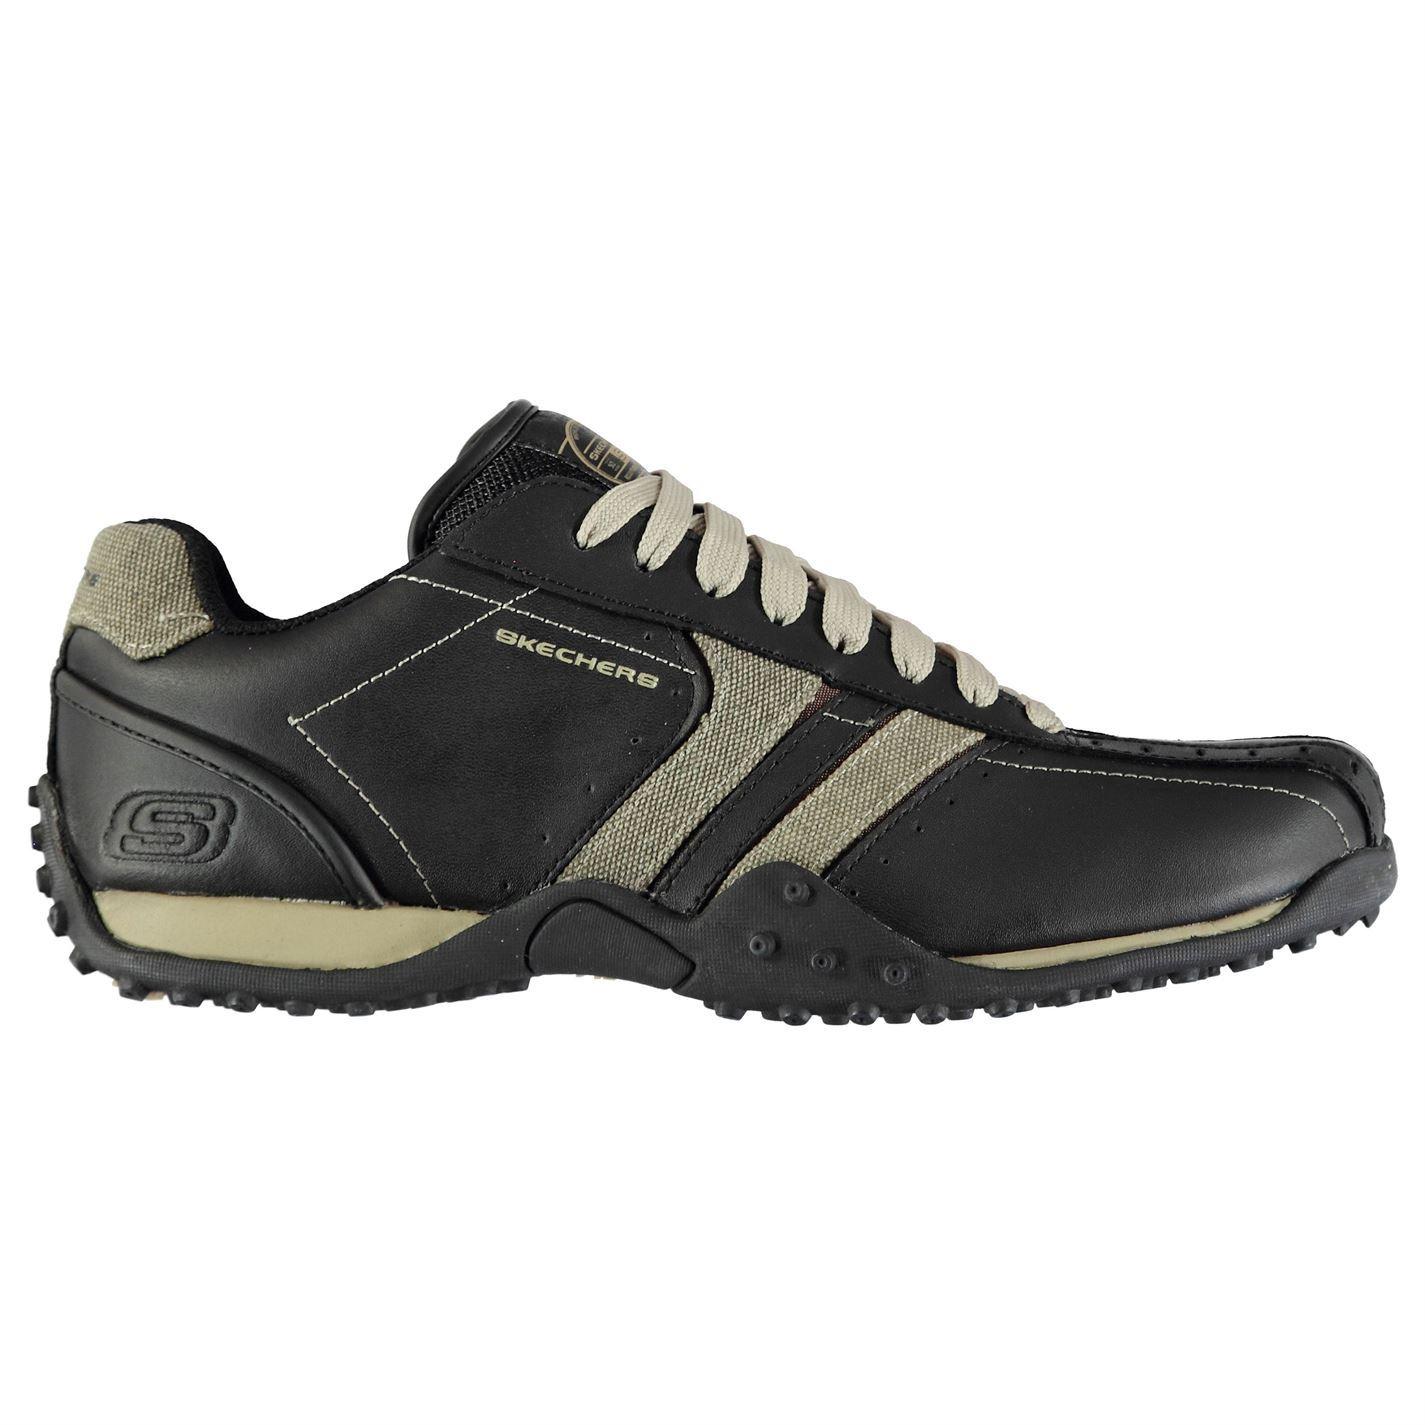 Skechers-Urban-Track-Forward-Trainers-Mens-Athleisure-Footwear-Shoes-Sneakers thumbnail 11